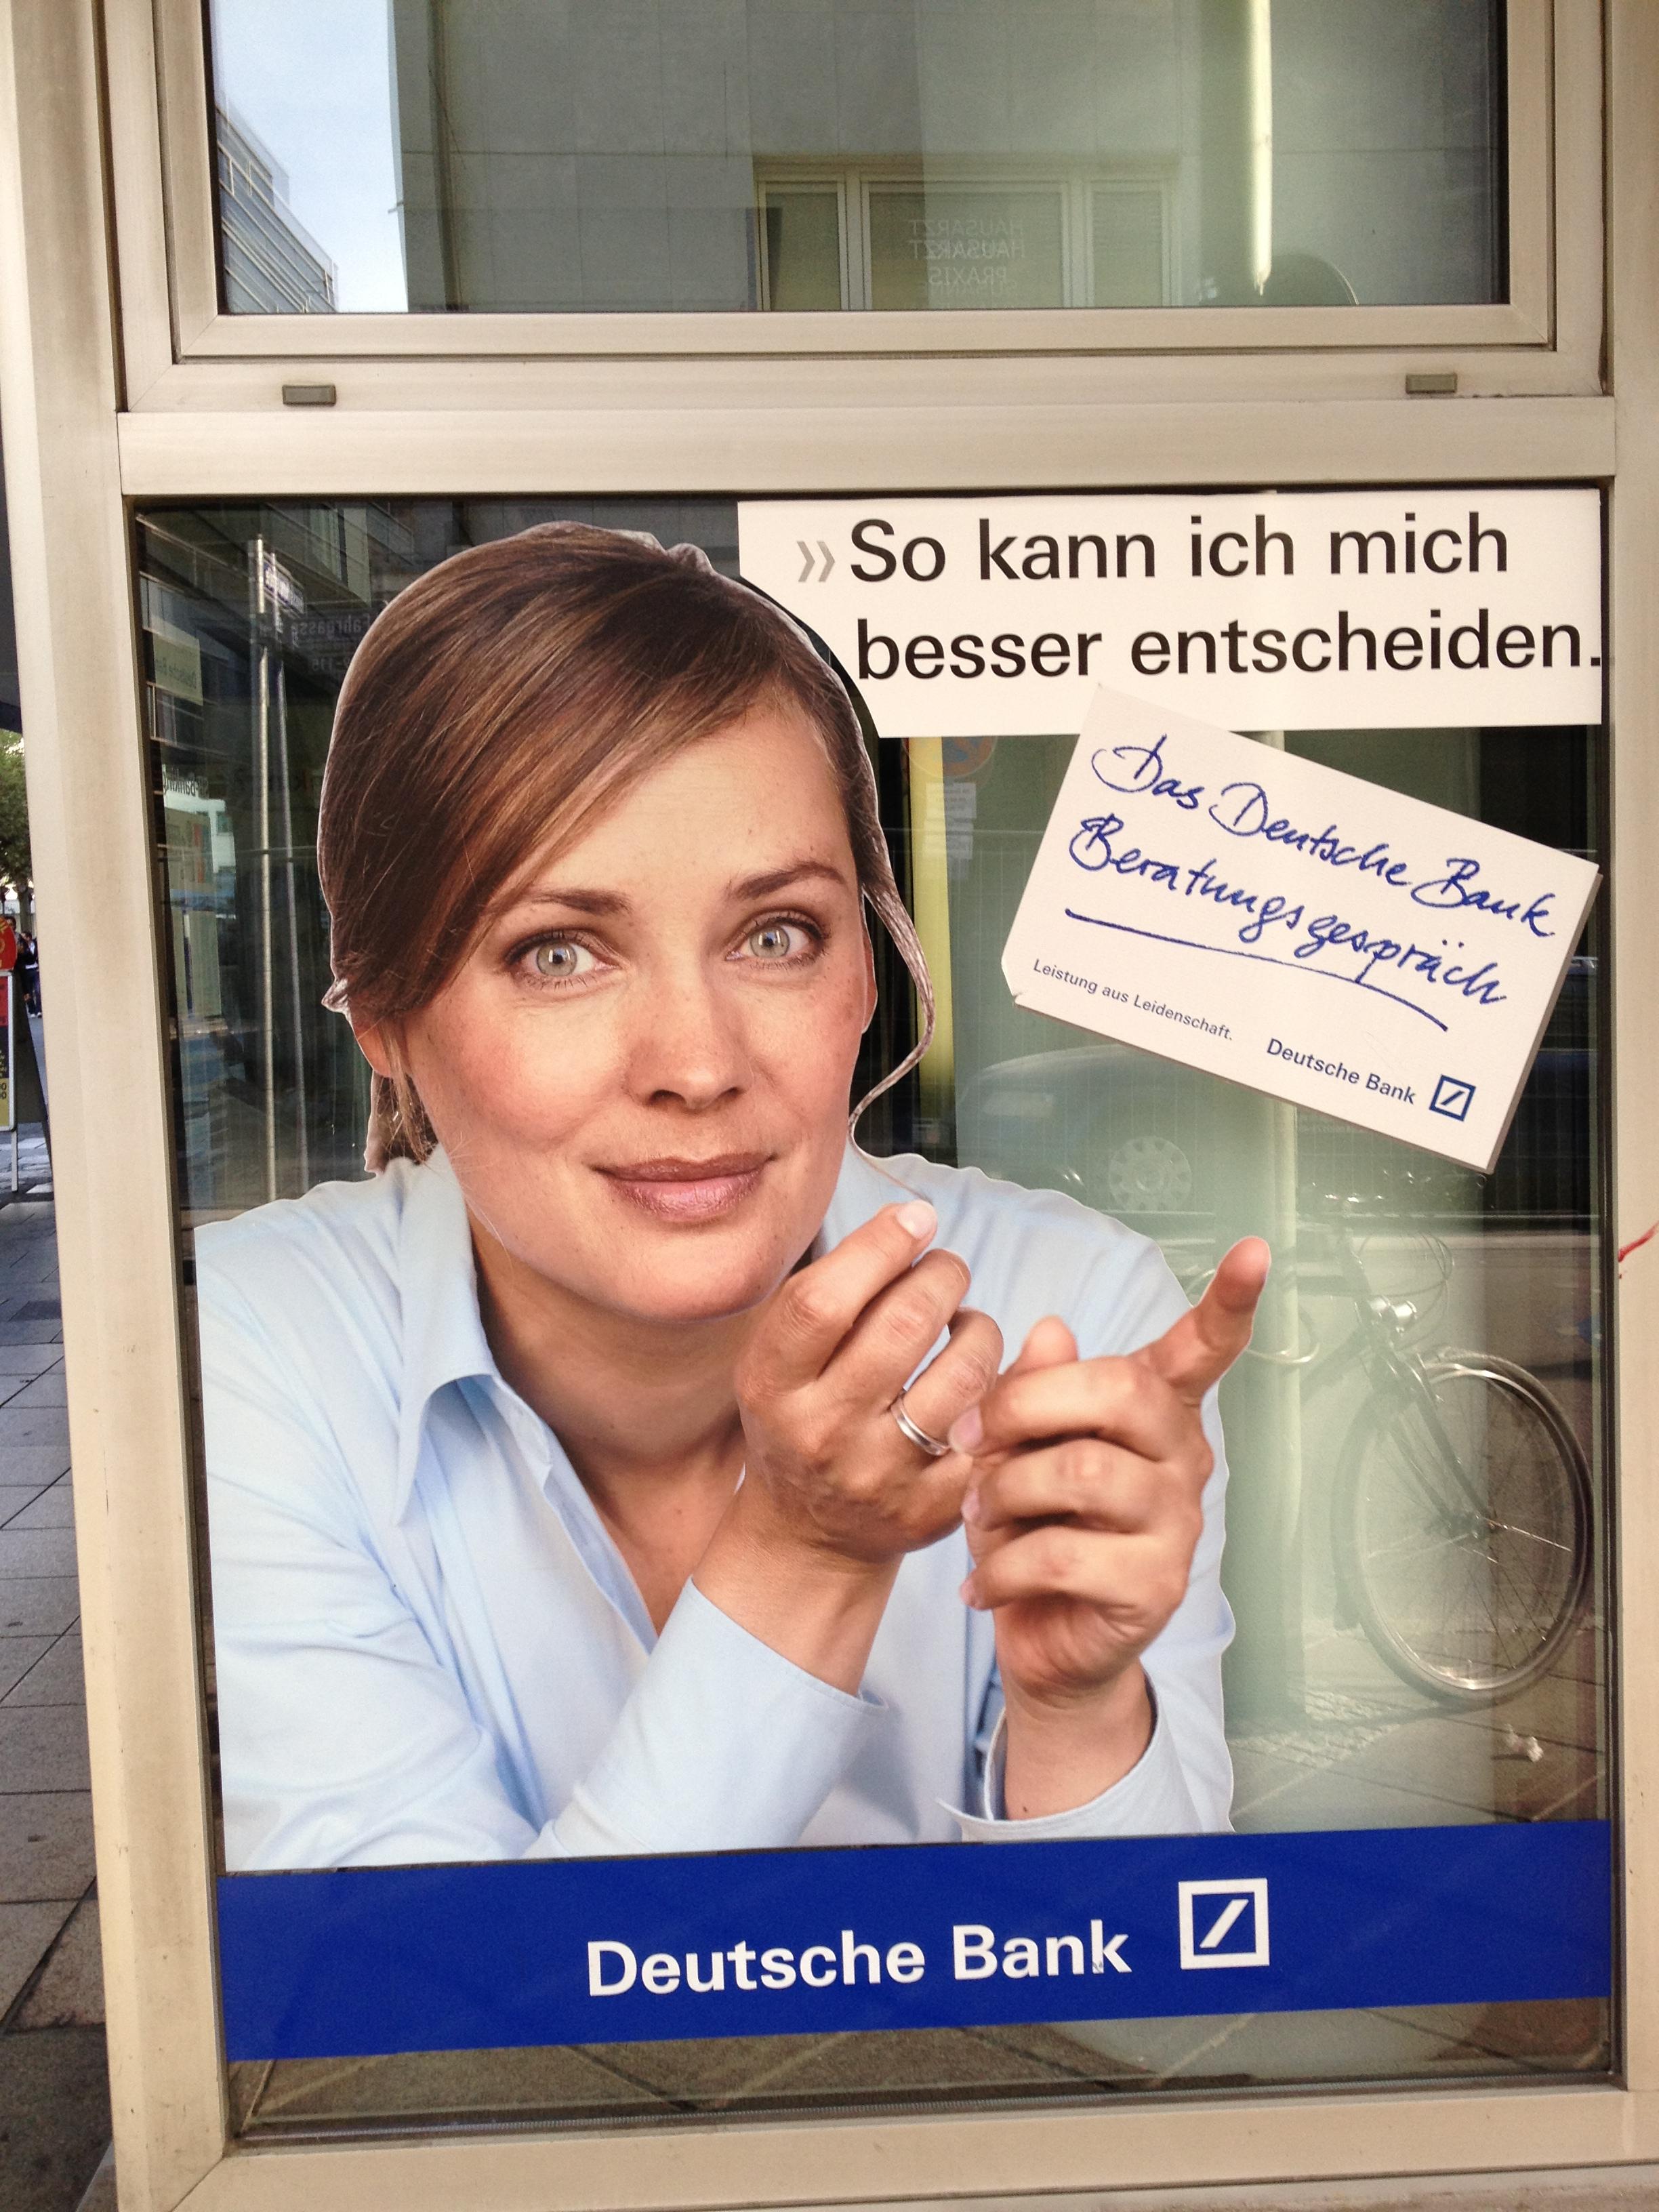 Deutsche penislänge